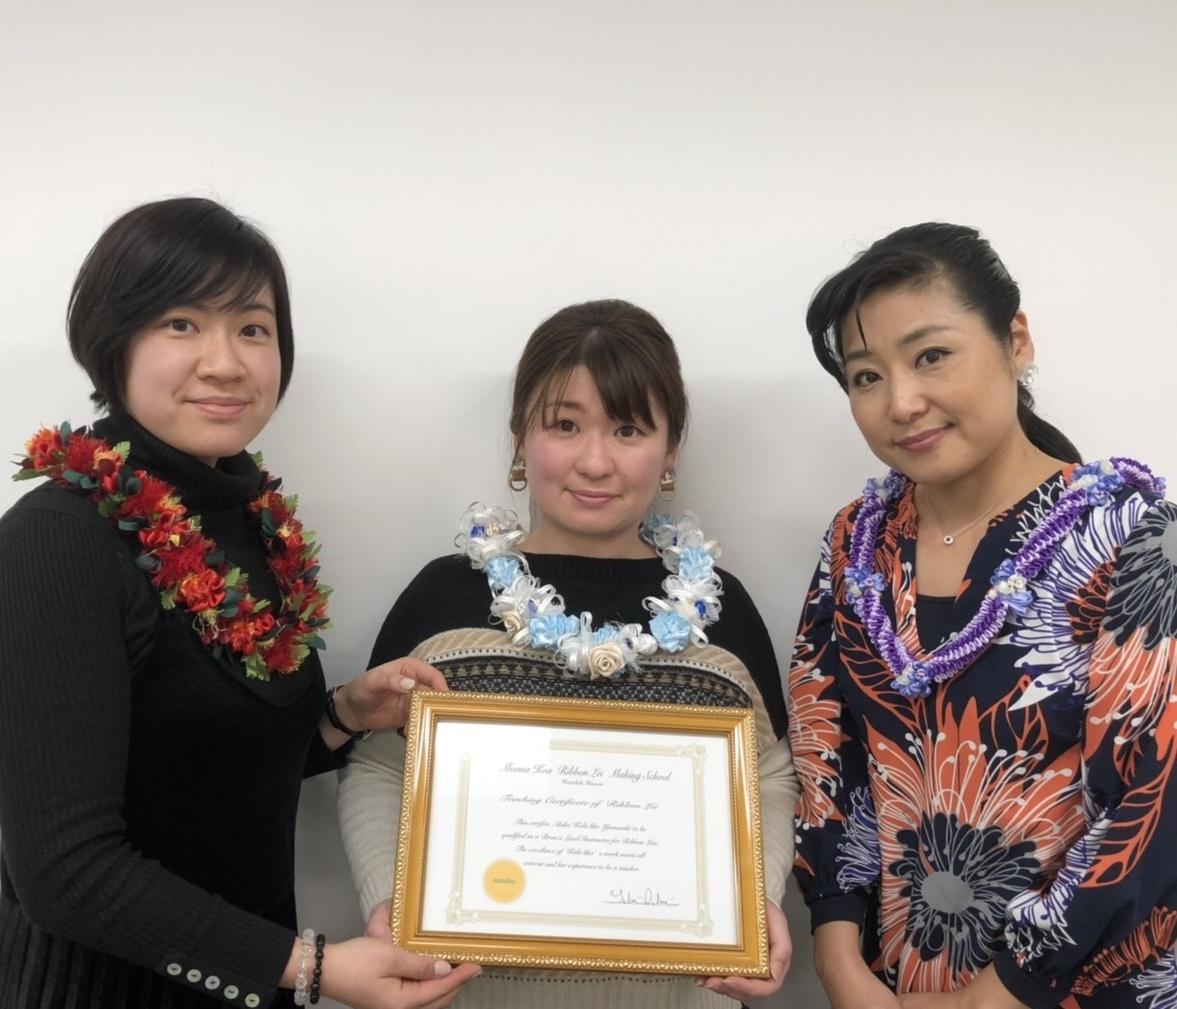 Akikoさんがサティフィケートを取得されました!_c0196240_22374942.jpeg